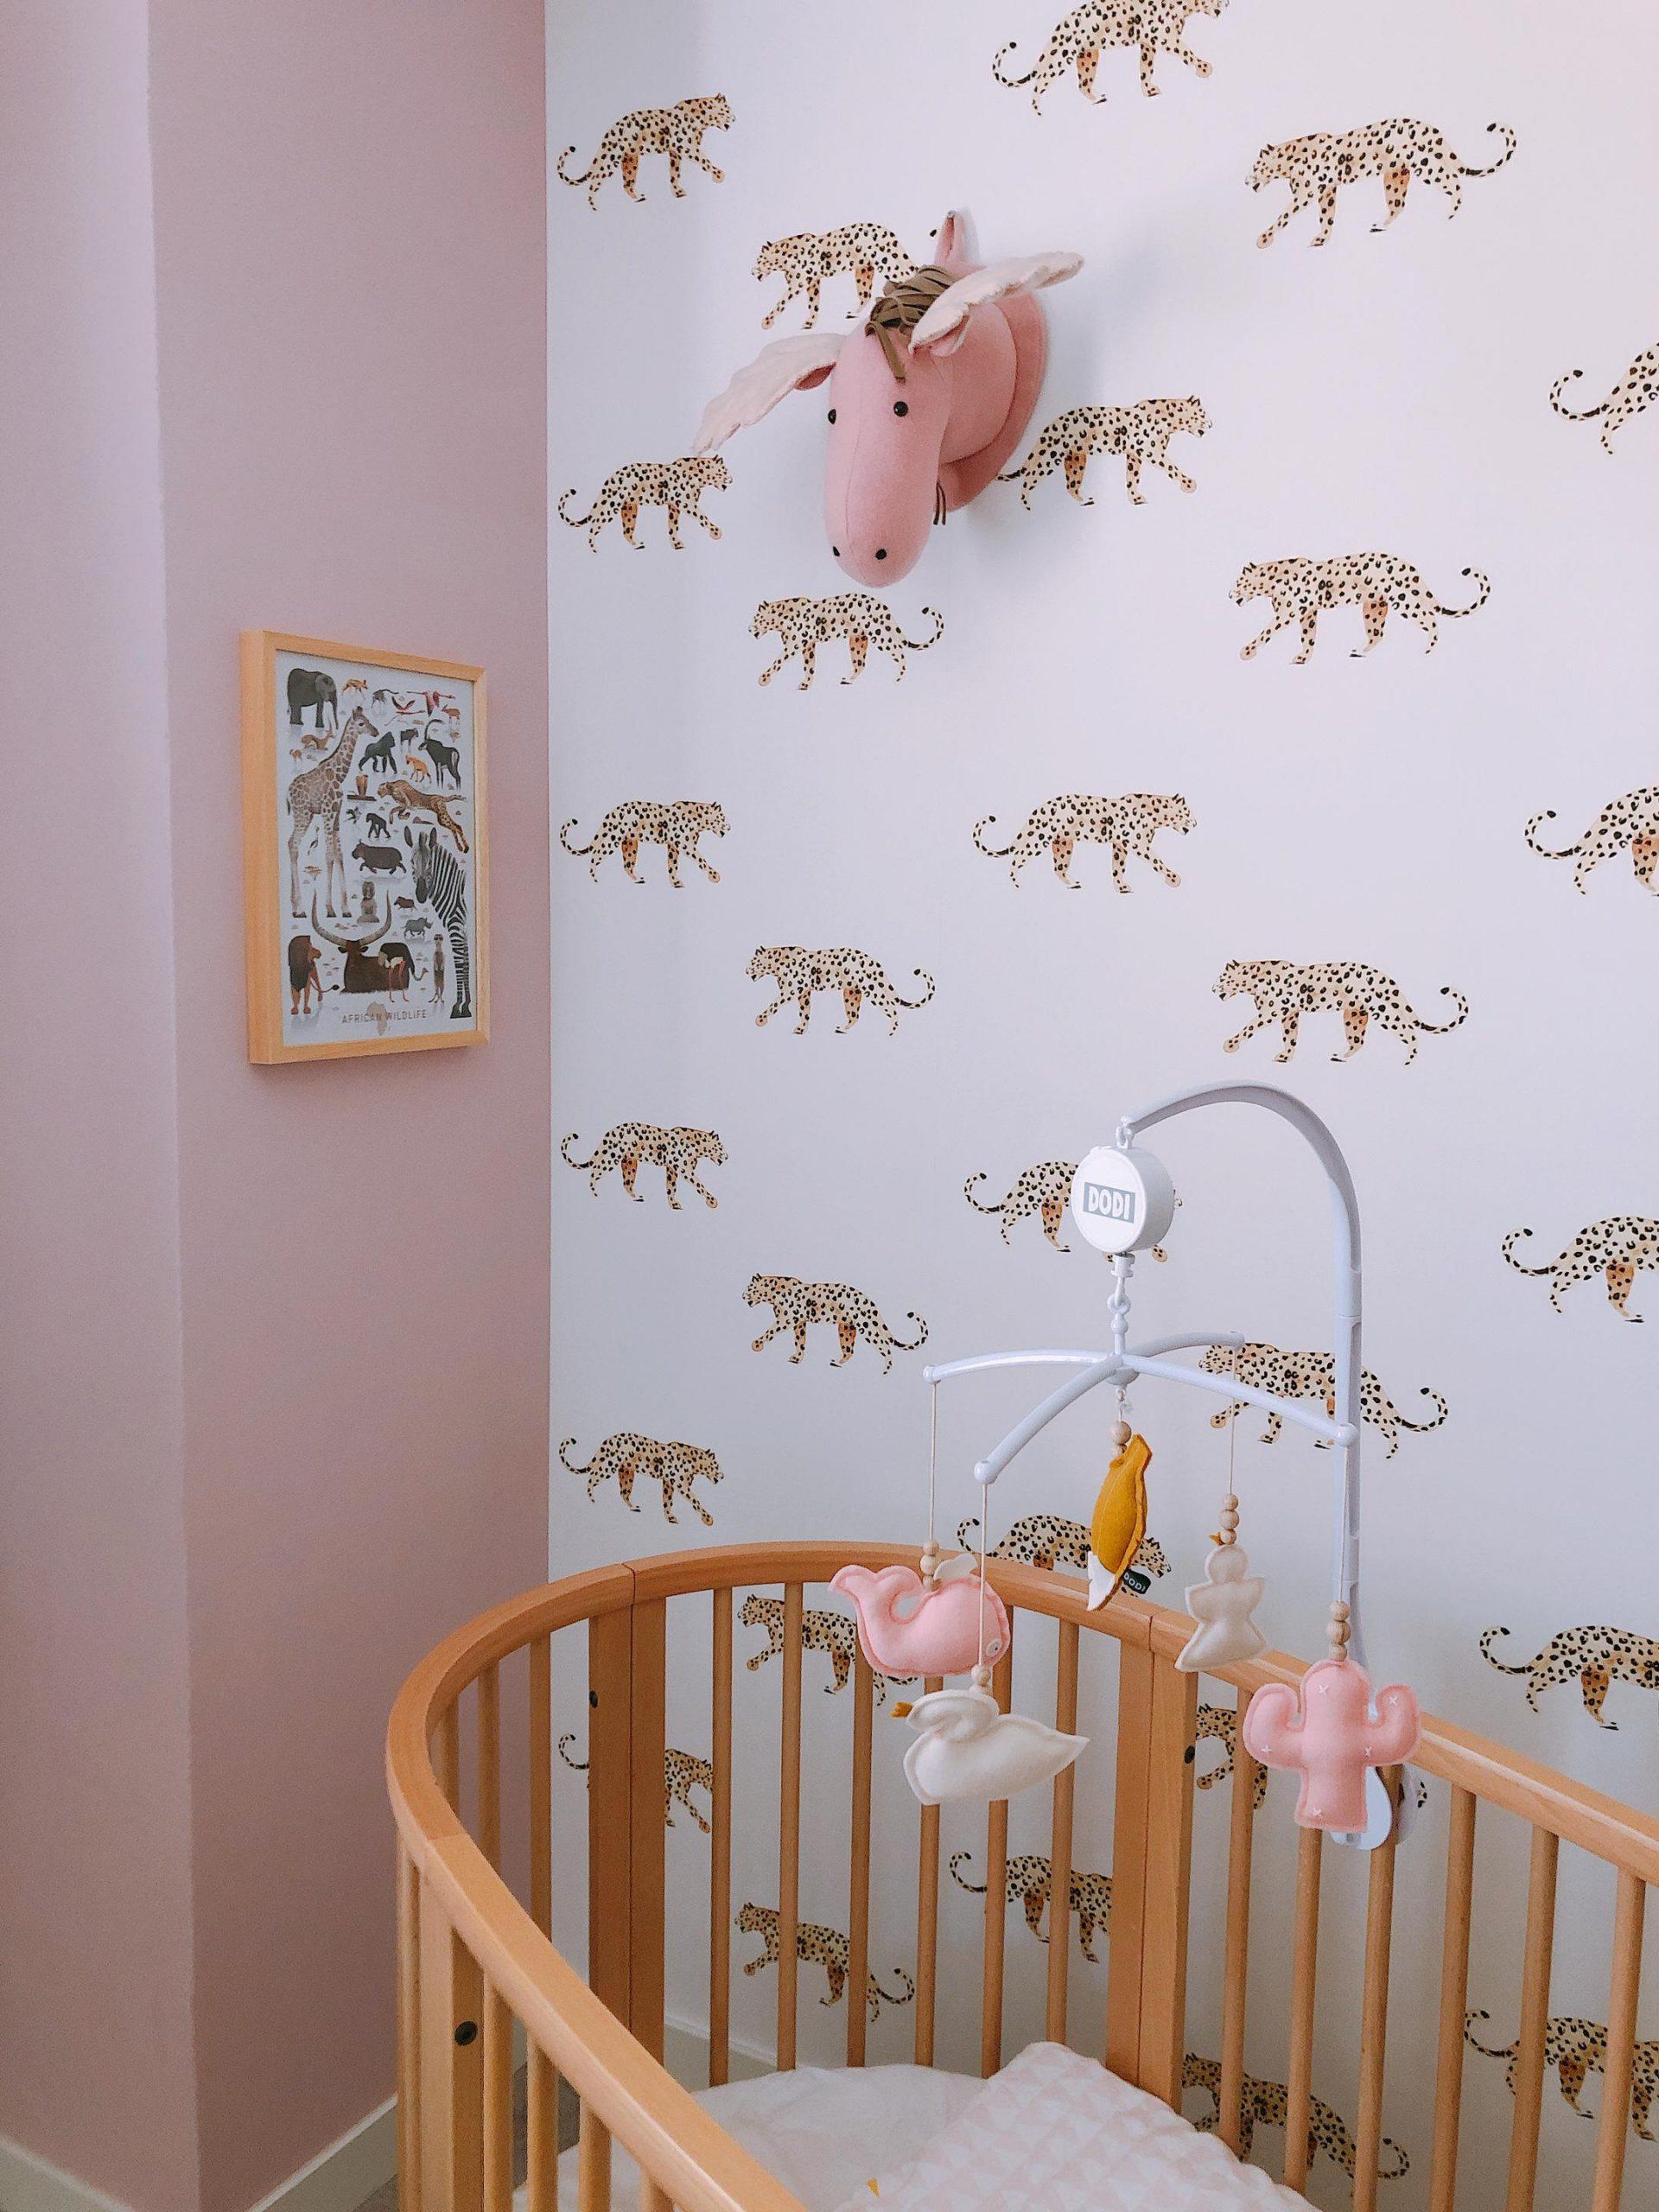 IMG 6864 2160x2880 2 scaled - De baby/kinderkamer van Hazel - roze, hout & marmer!